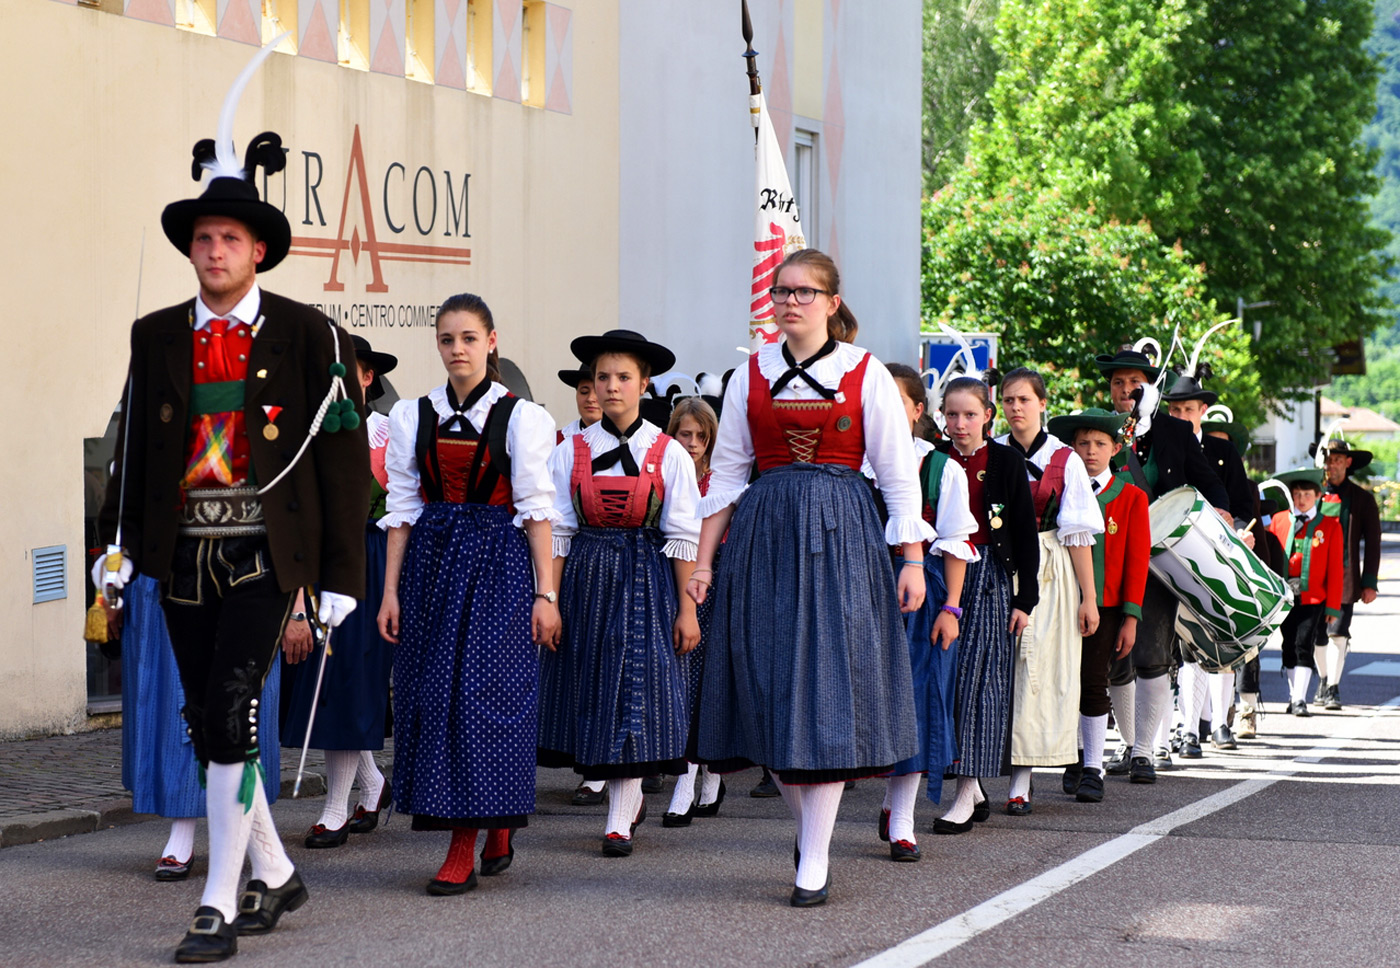 Einladung zum 15. Gesamttiroler Jungschützentreffen